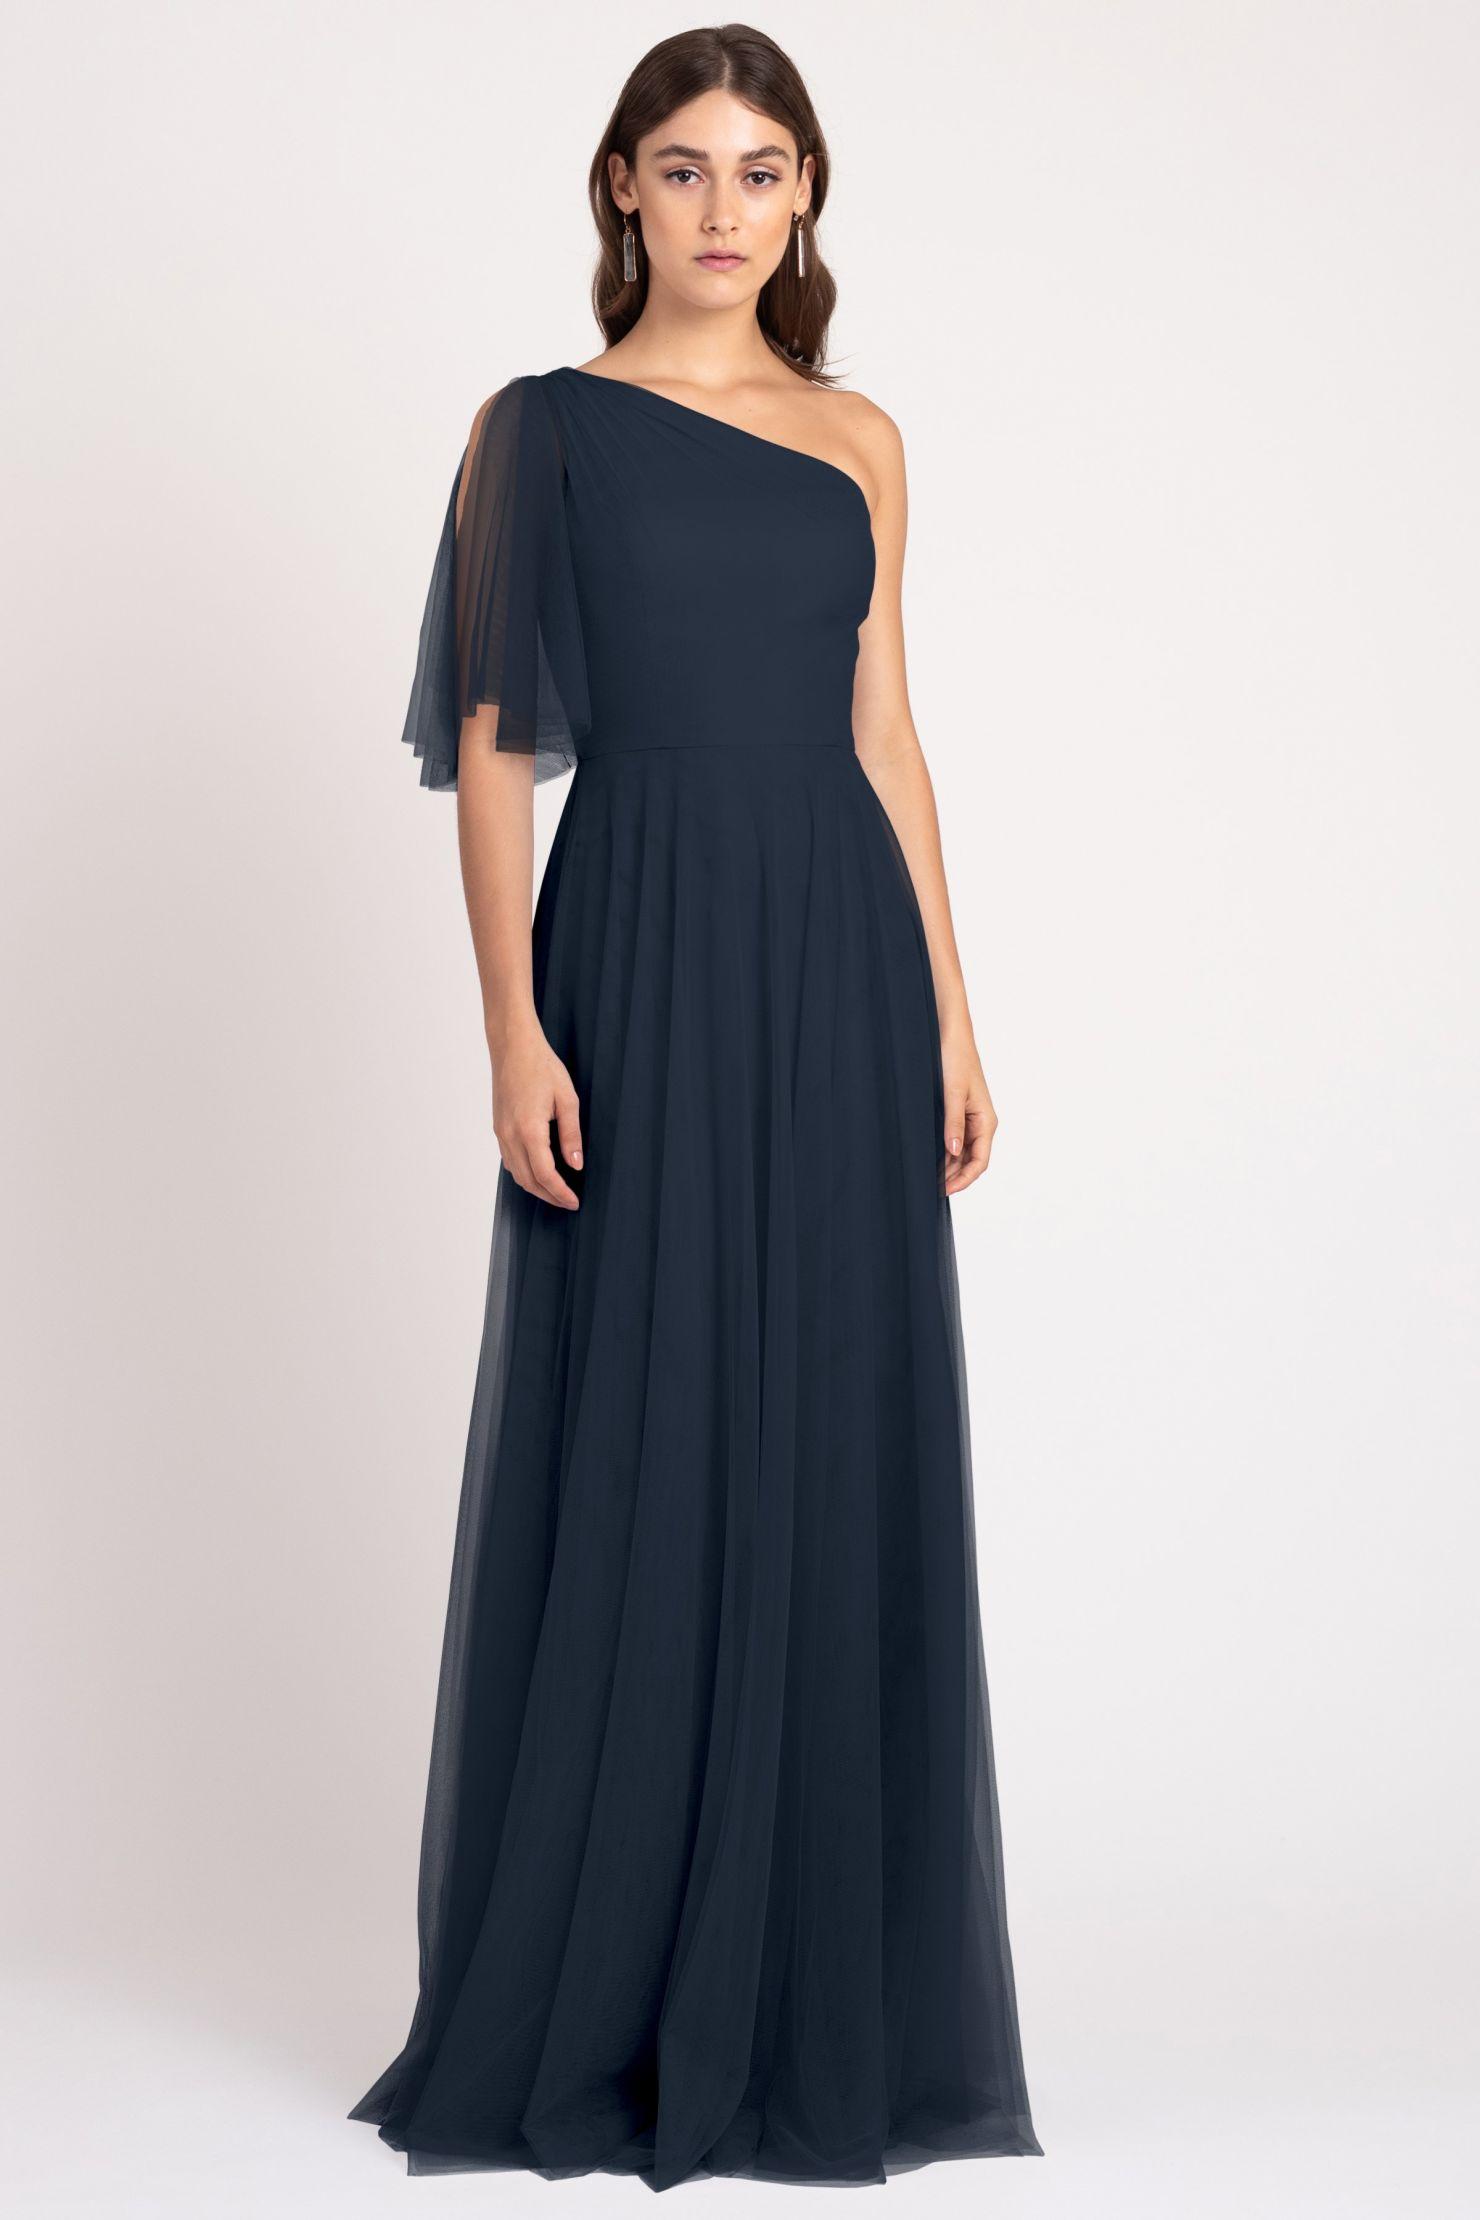 Mallory Bridesmaids Dress by Jenny Yoo - Navy Blue